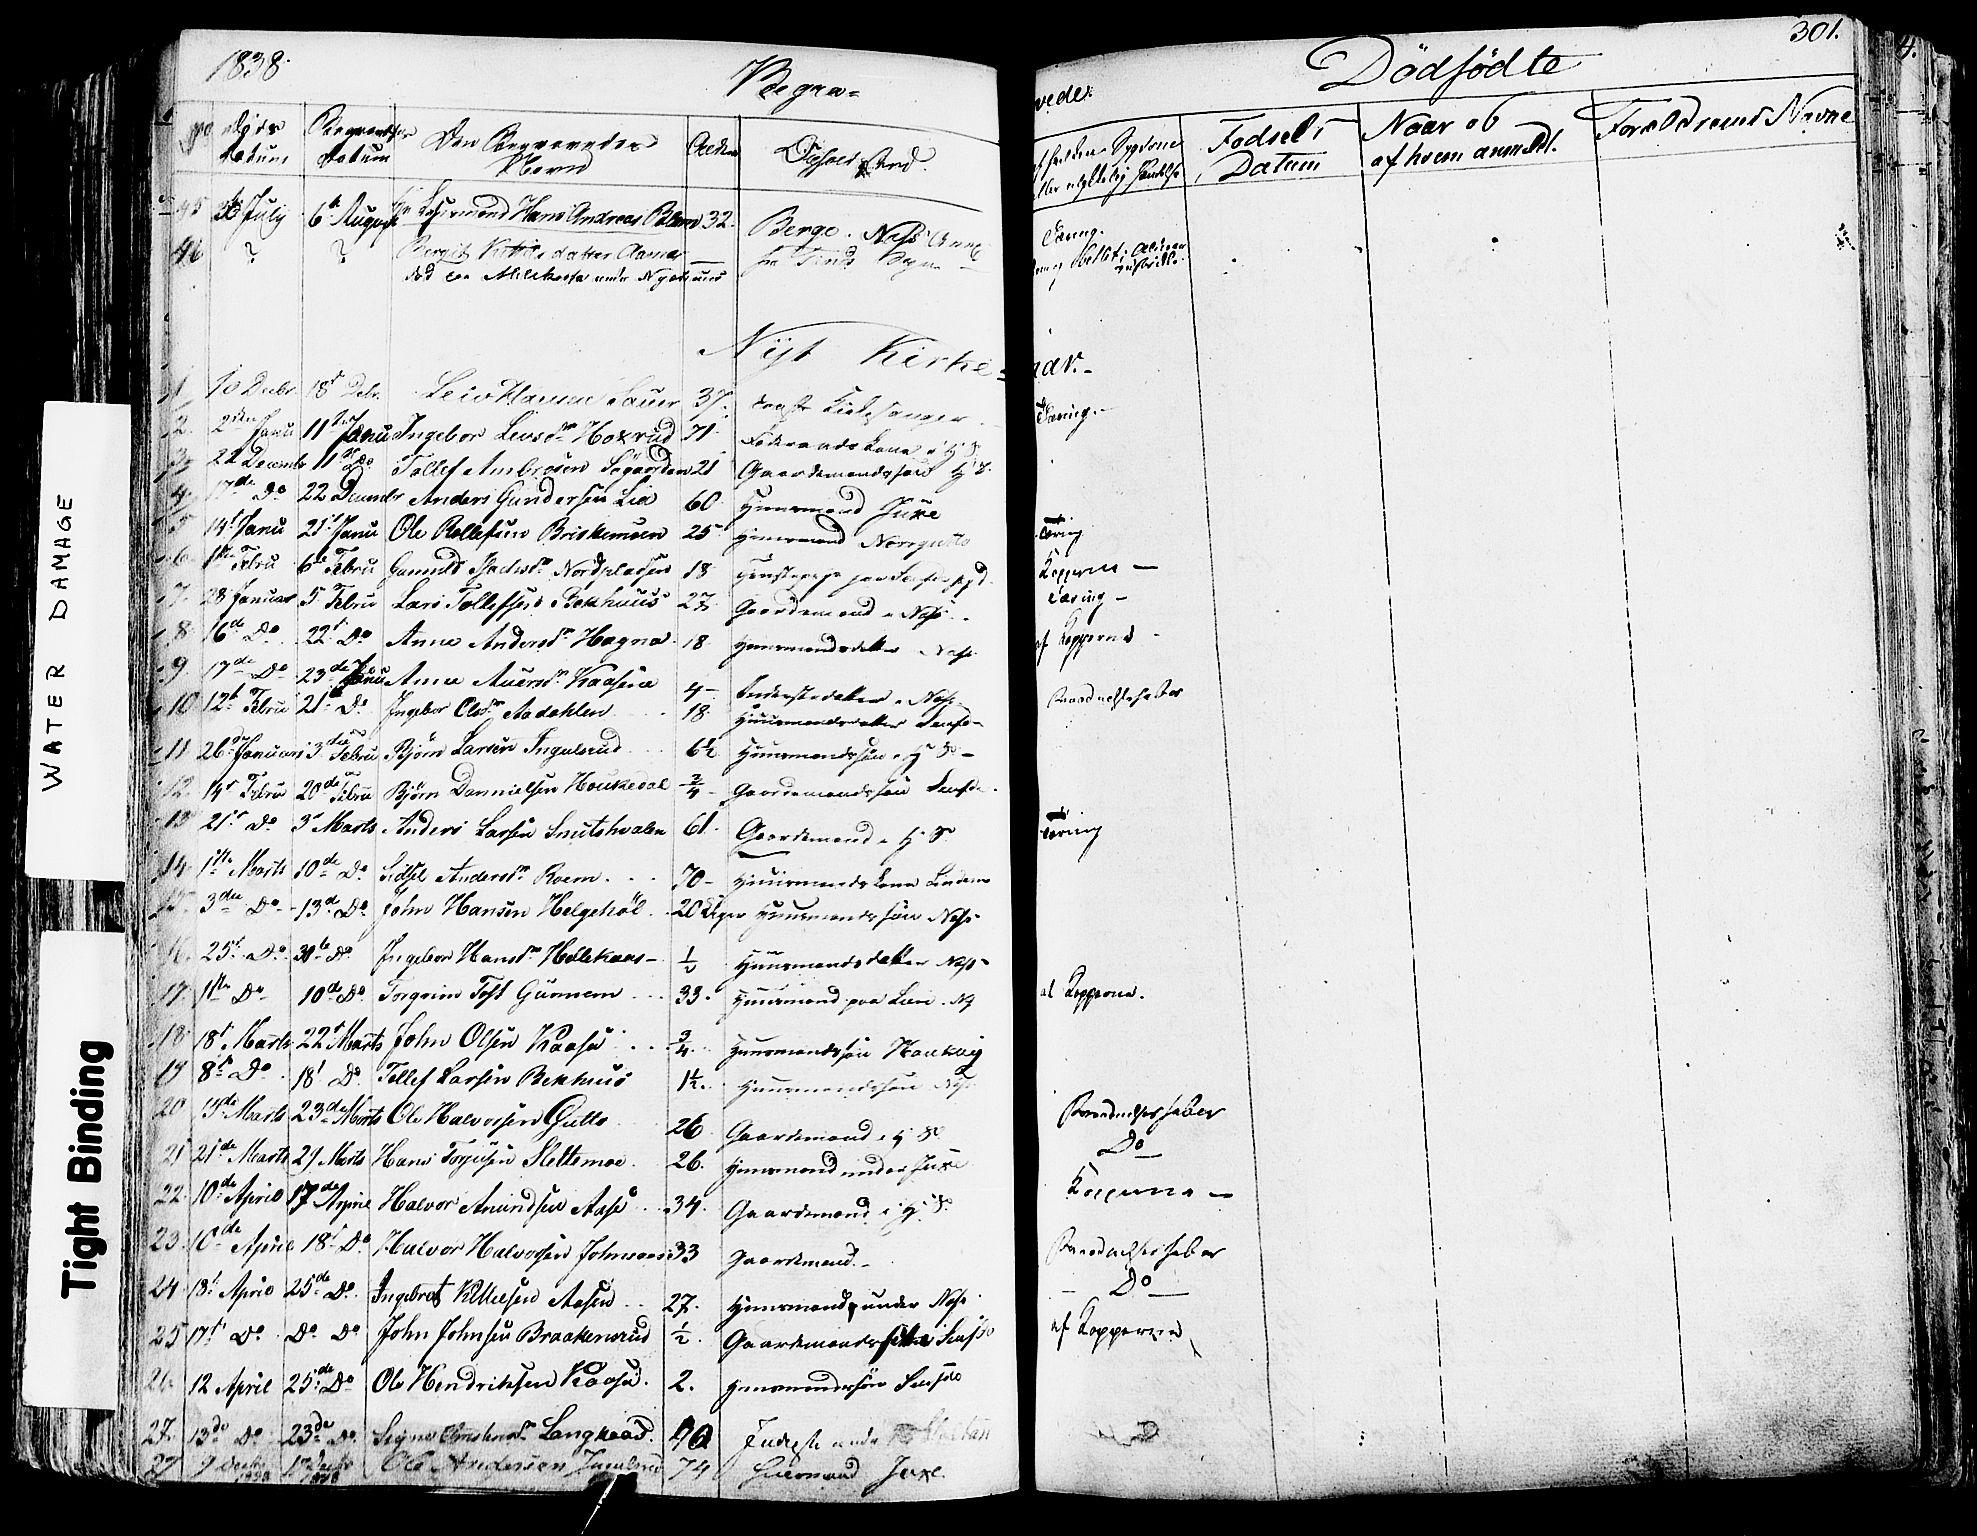 SAKO, Sauherad kirkebøker, F/Fa/L0006: Ministerialbok nr. I 6, 1827-1850, s. 301